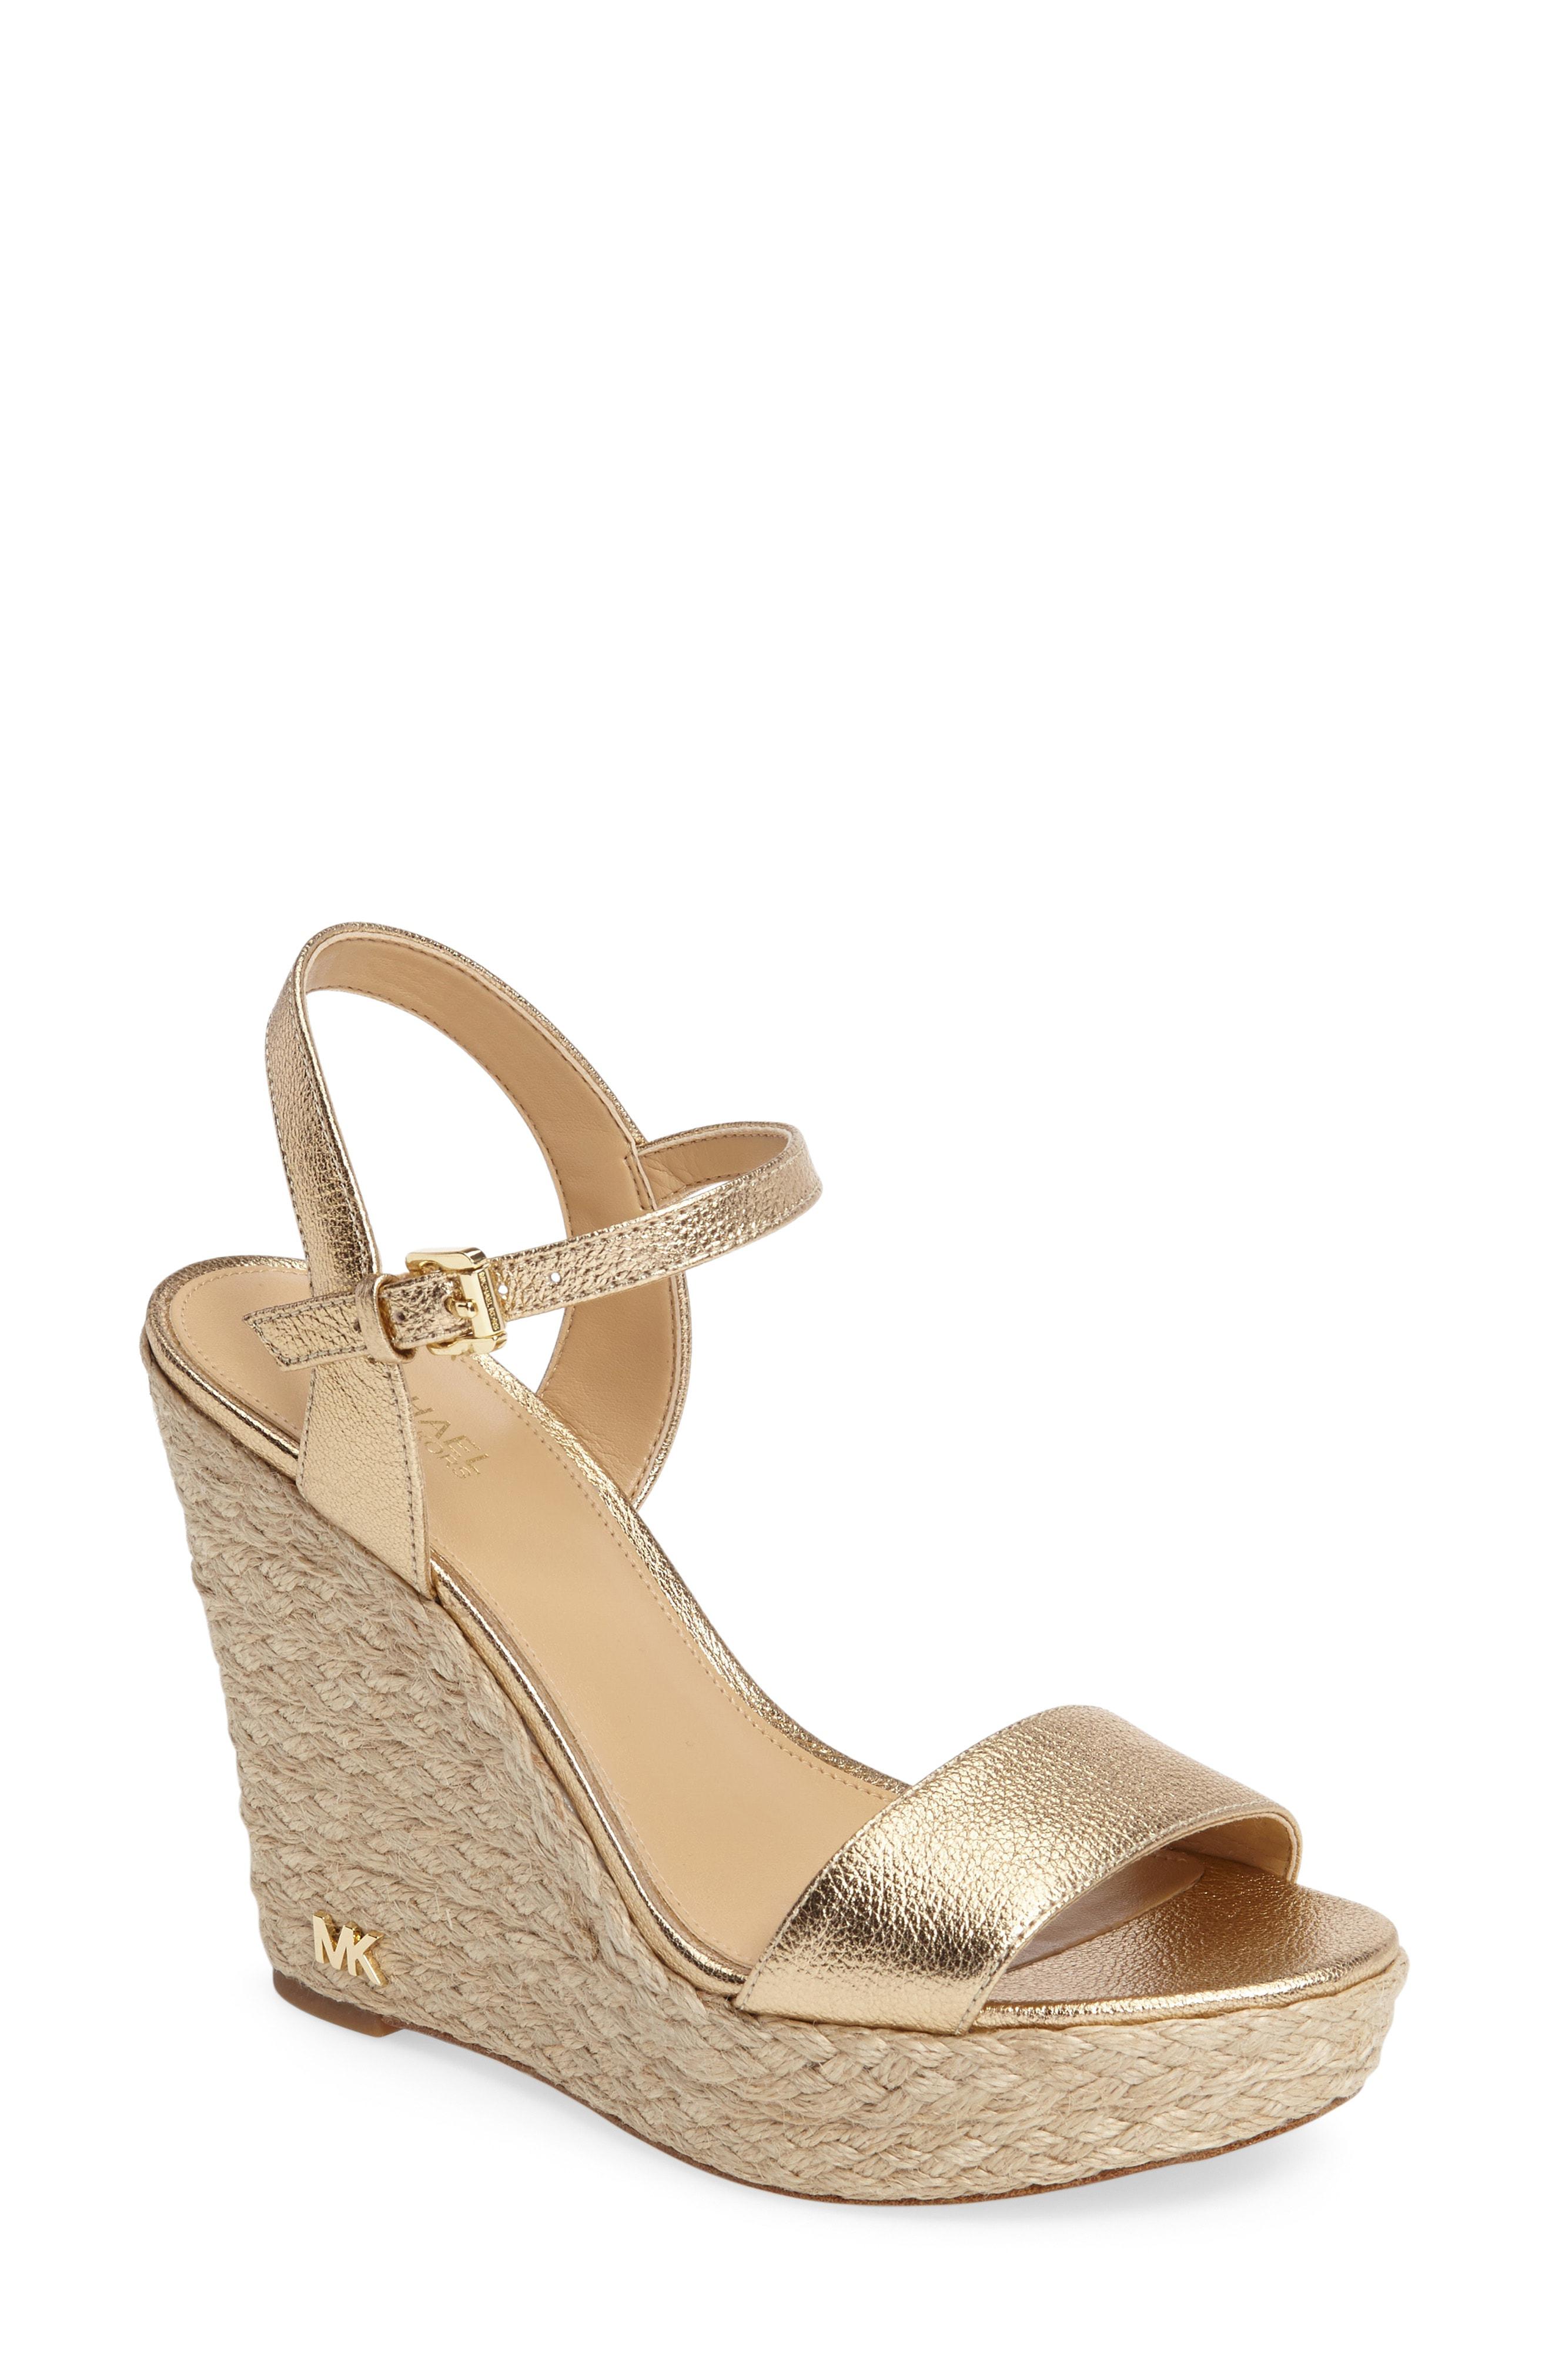 56f3887745f Michael Michael Kors Women s Jill Leather Espadrille Platform Wedge Sandals  In Pale Gold